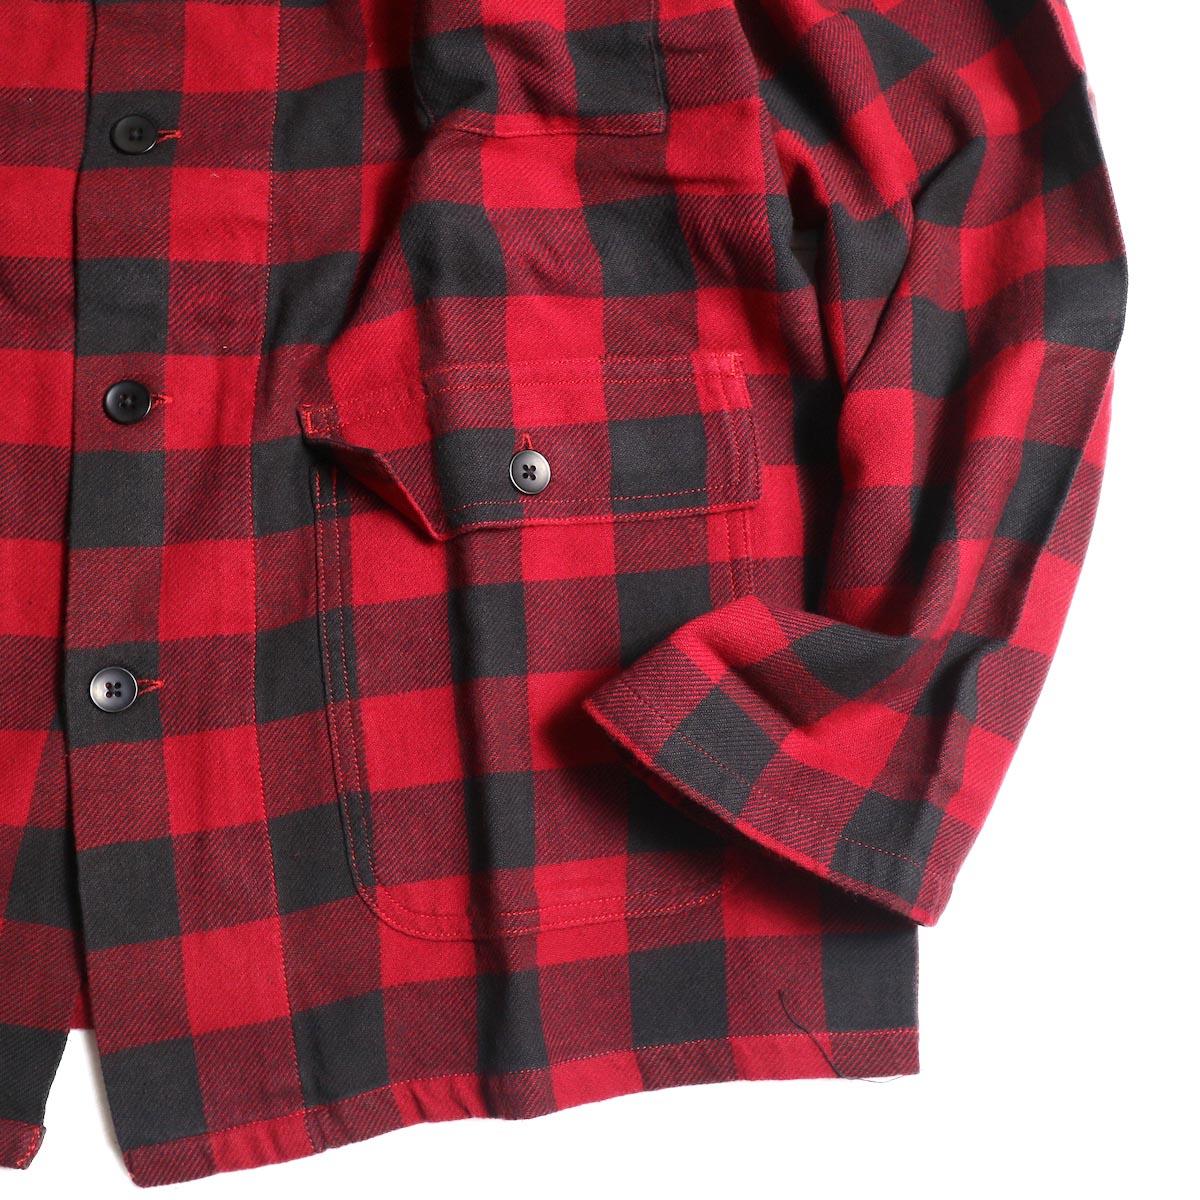 South2 West8 / Hunting Shirt -Plaid Twill (Red/Black)袖、裾